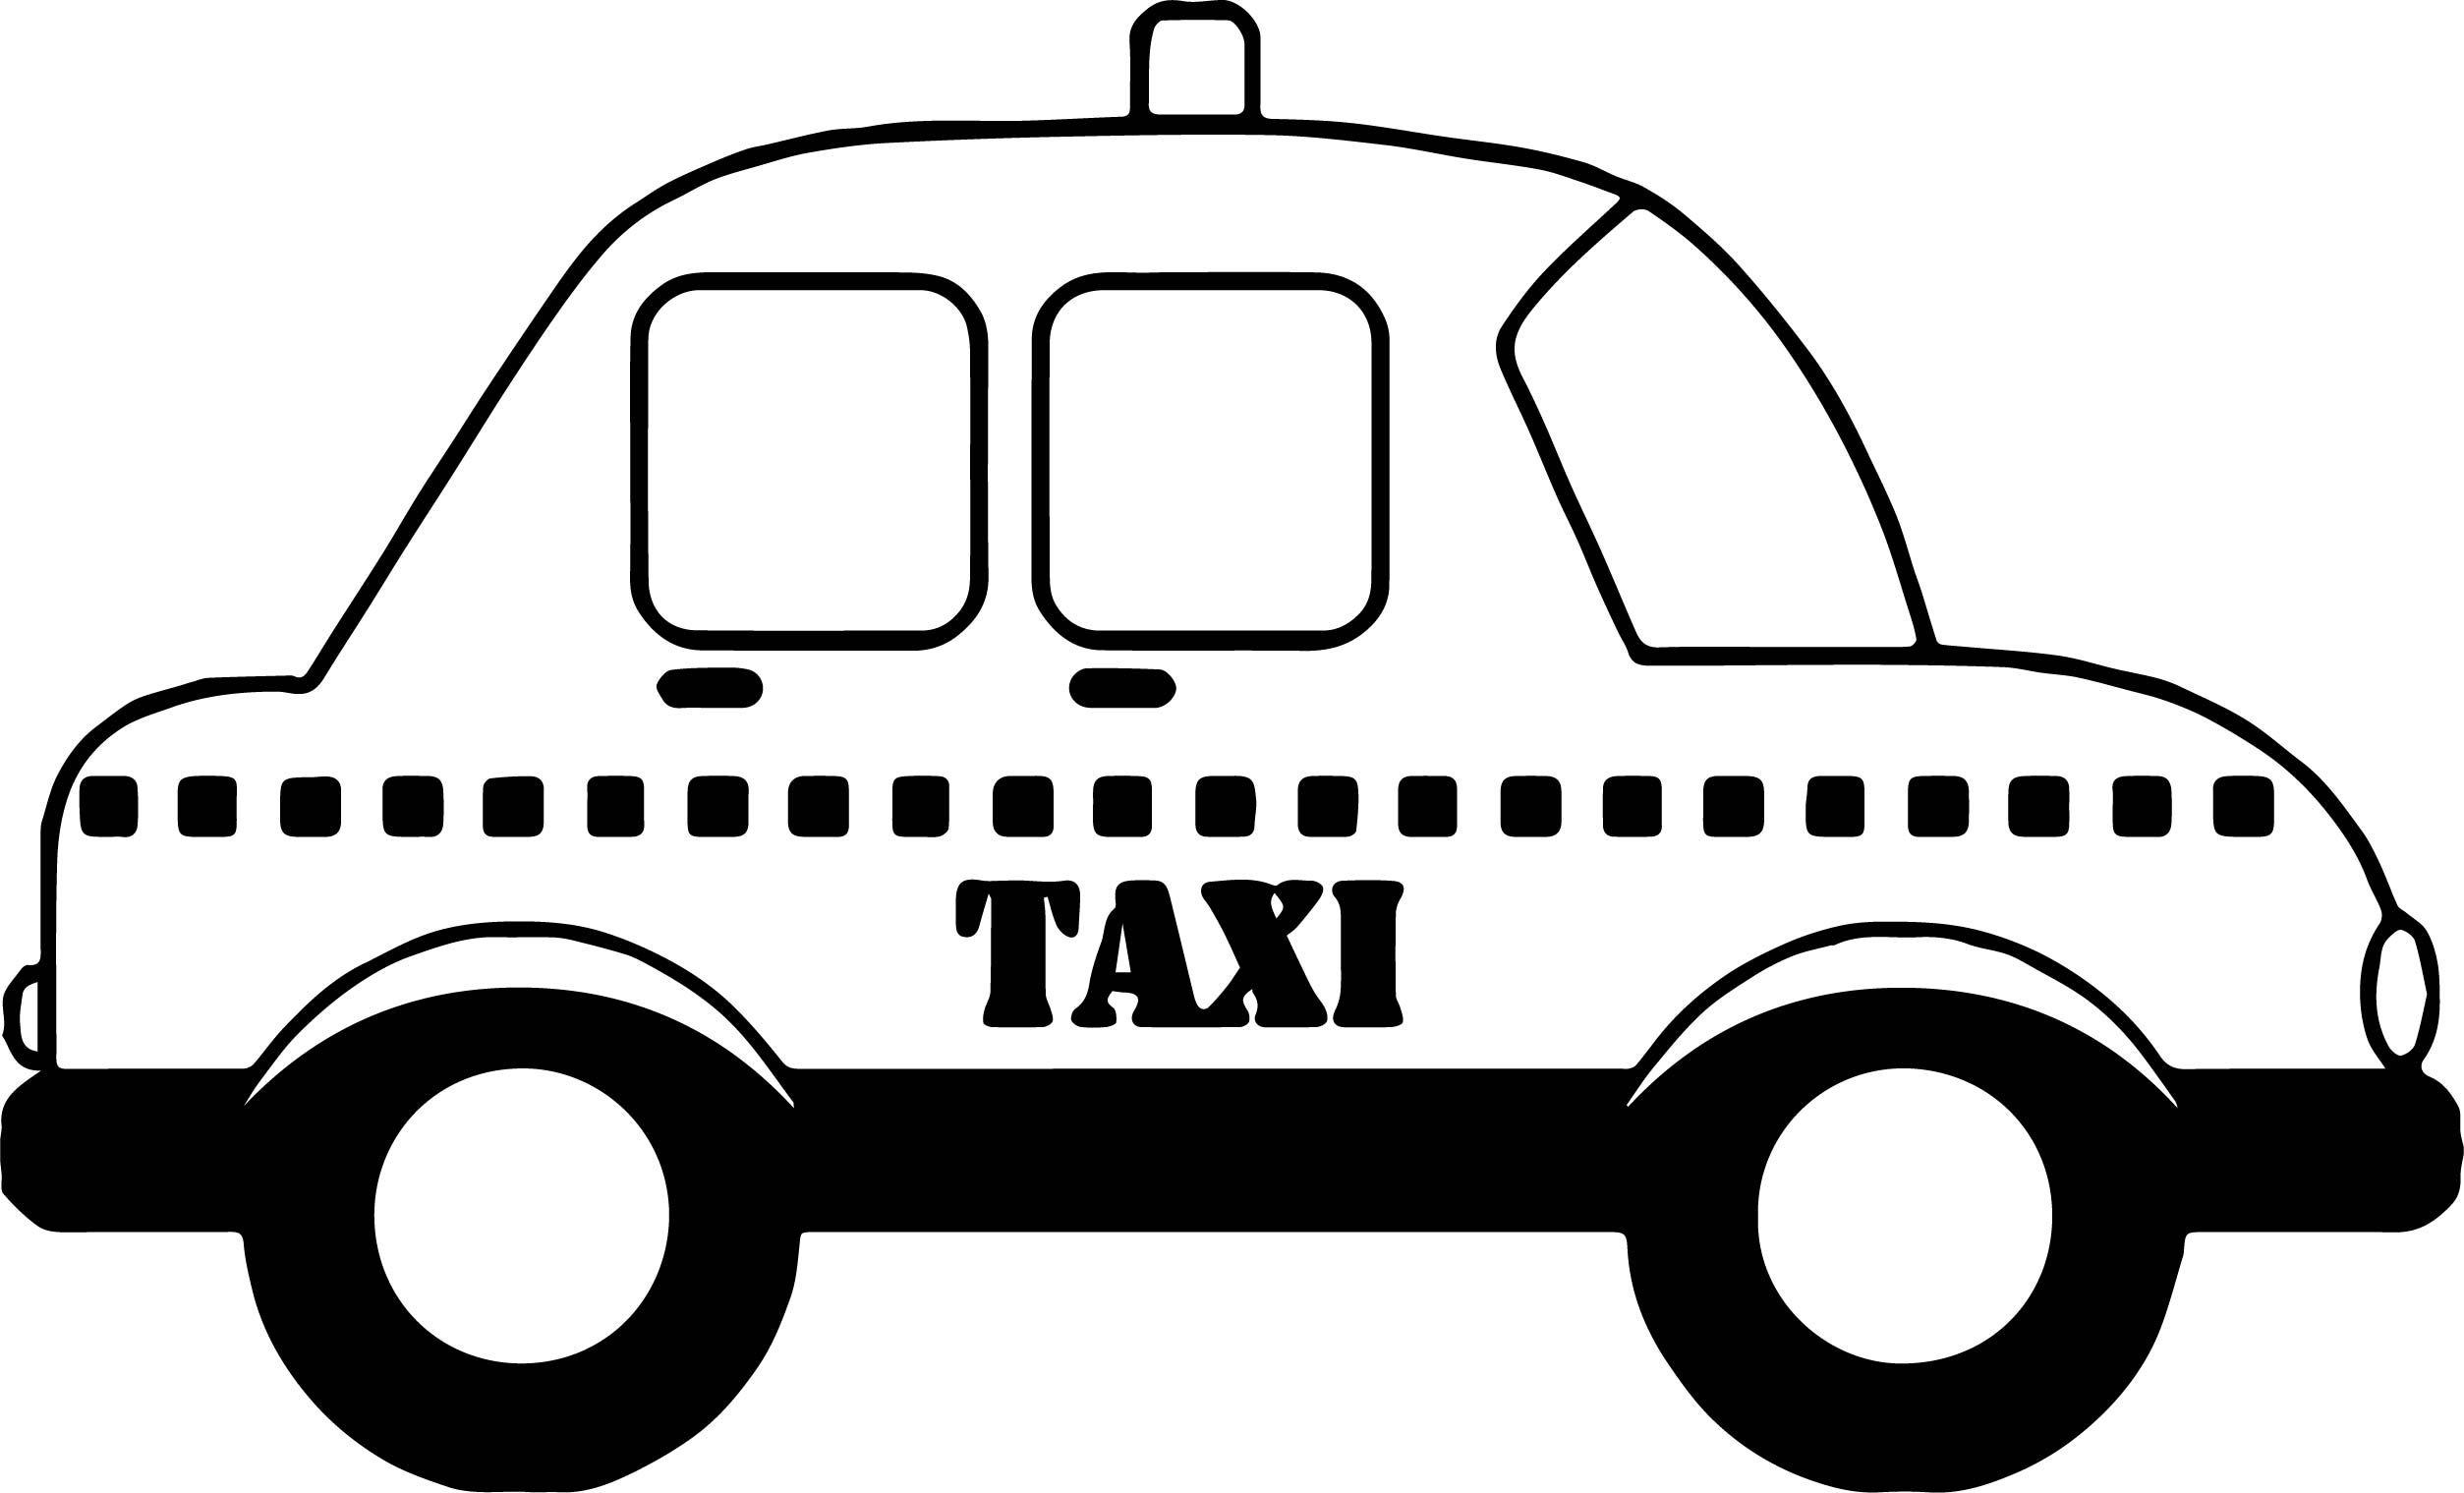 Cool Taxi Car Coloring Page Boyama Sayfalari Araba Otomobil